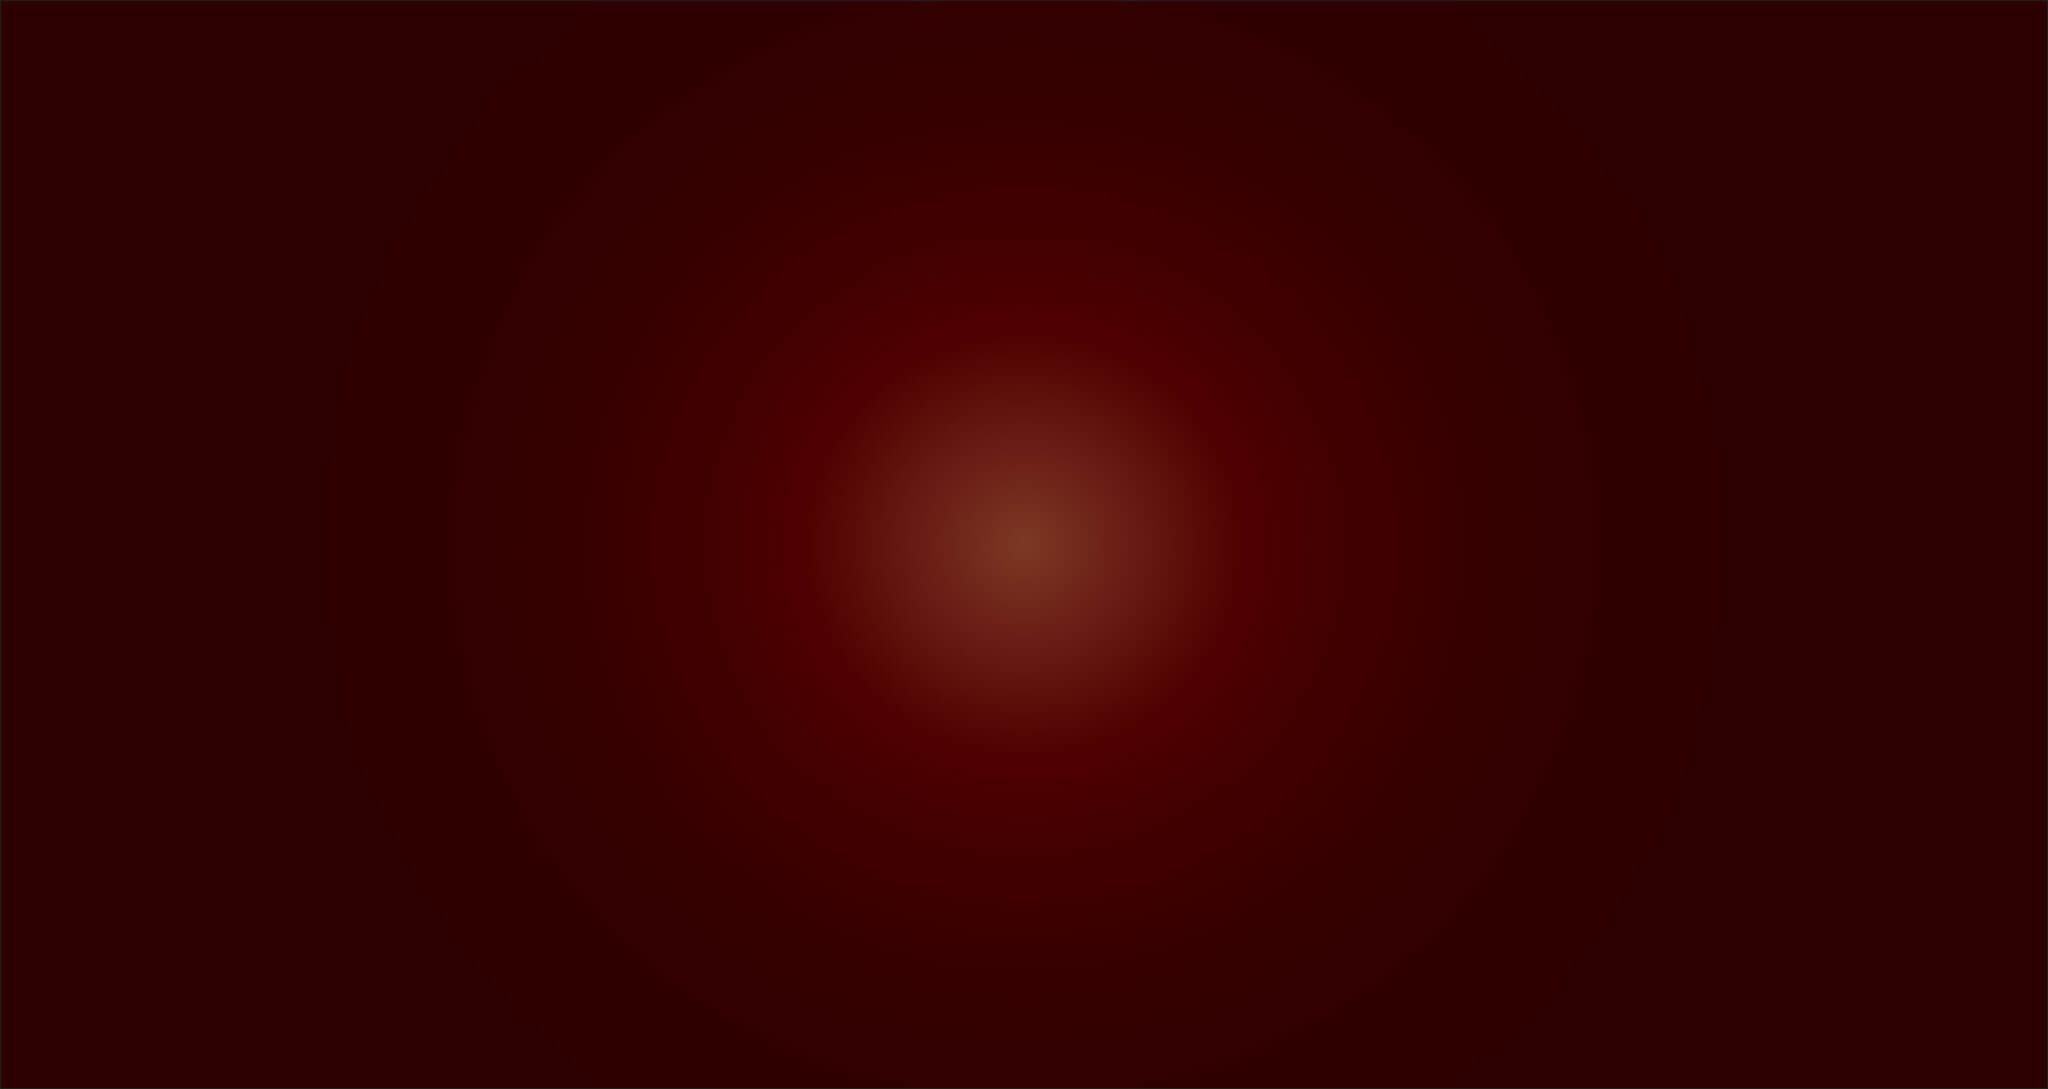 10mfh-background-red3.jpg